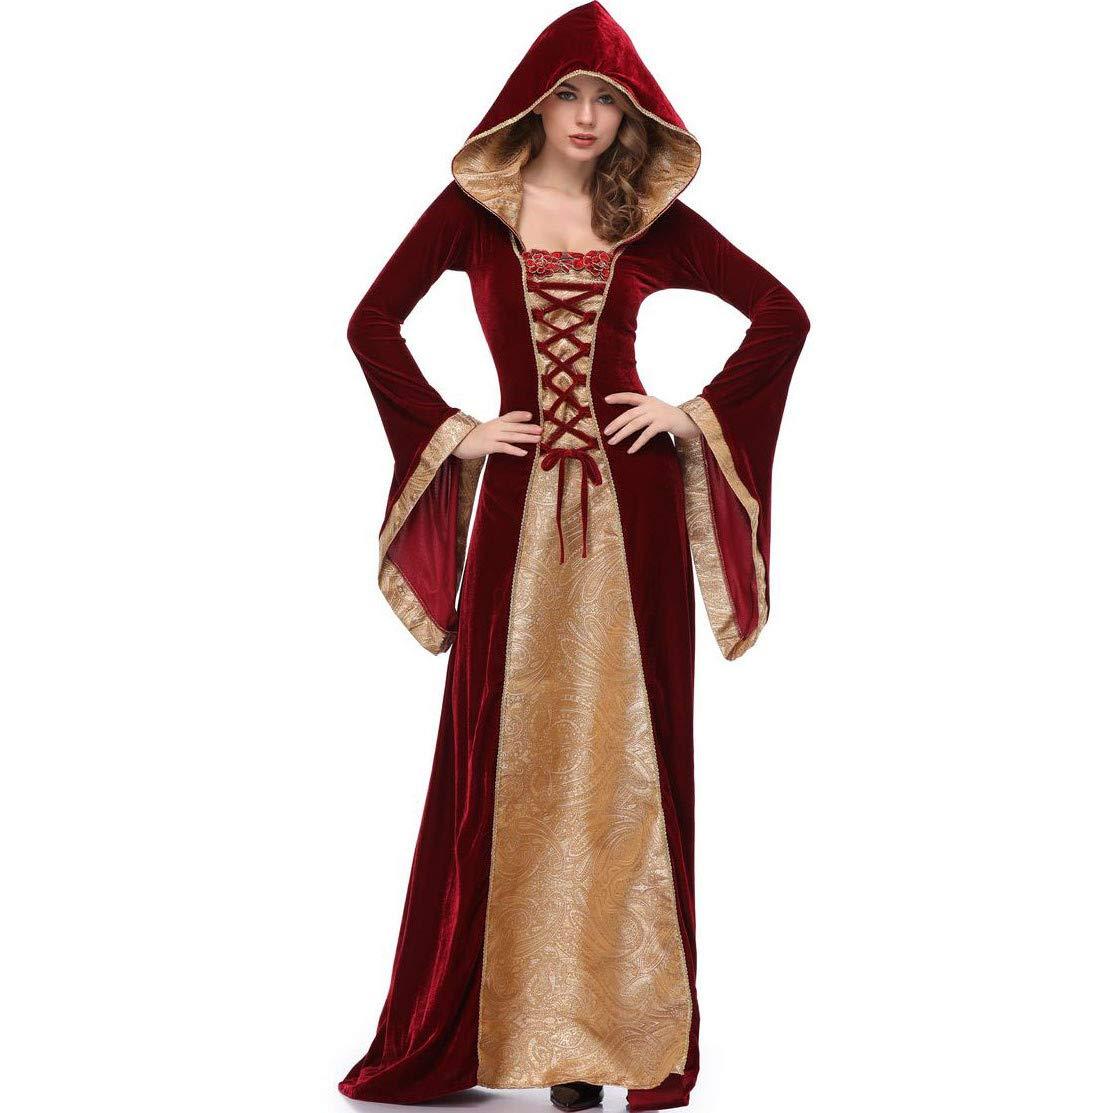 Renaissance Costume Women Medieval Dress Lace Up Vintage Floor Length Cosplay Retro Long Dress Princess Dress (M, Red03) by Chaofanjiancai_Dress